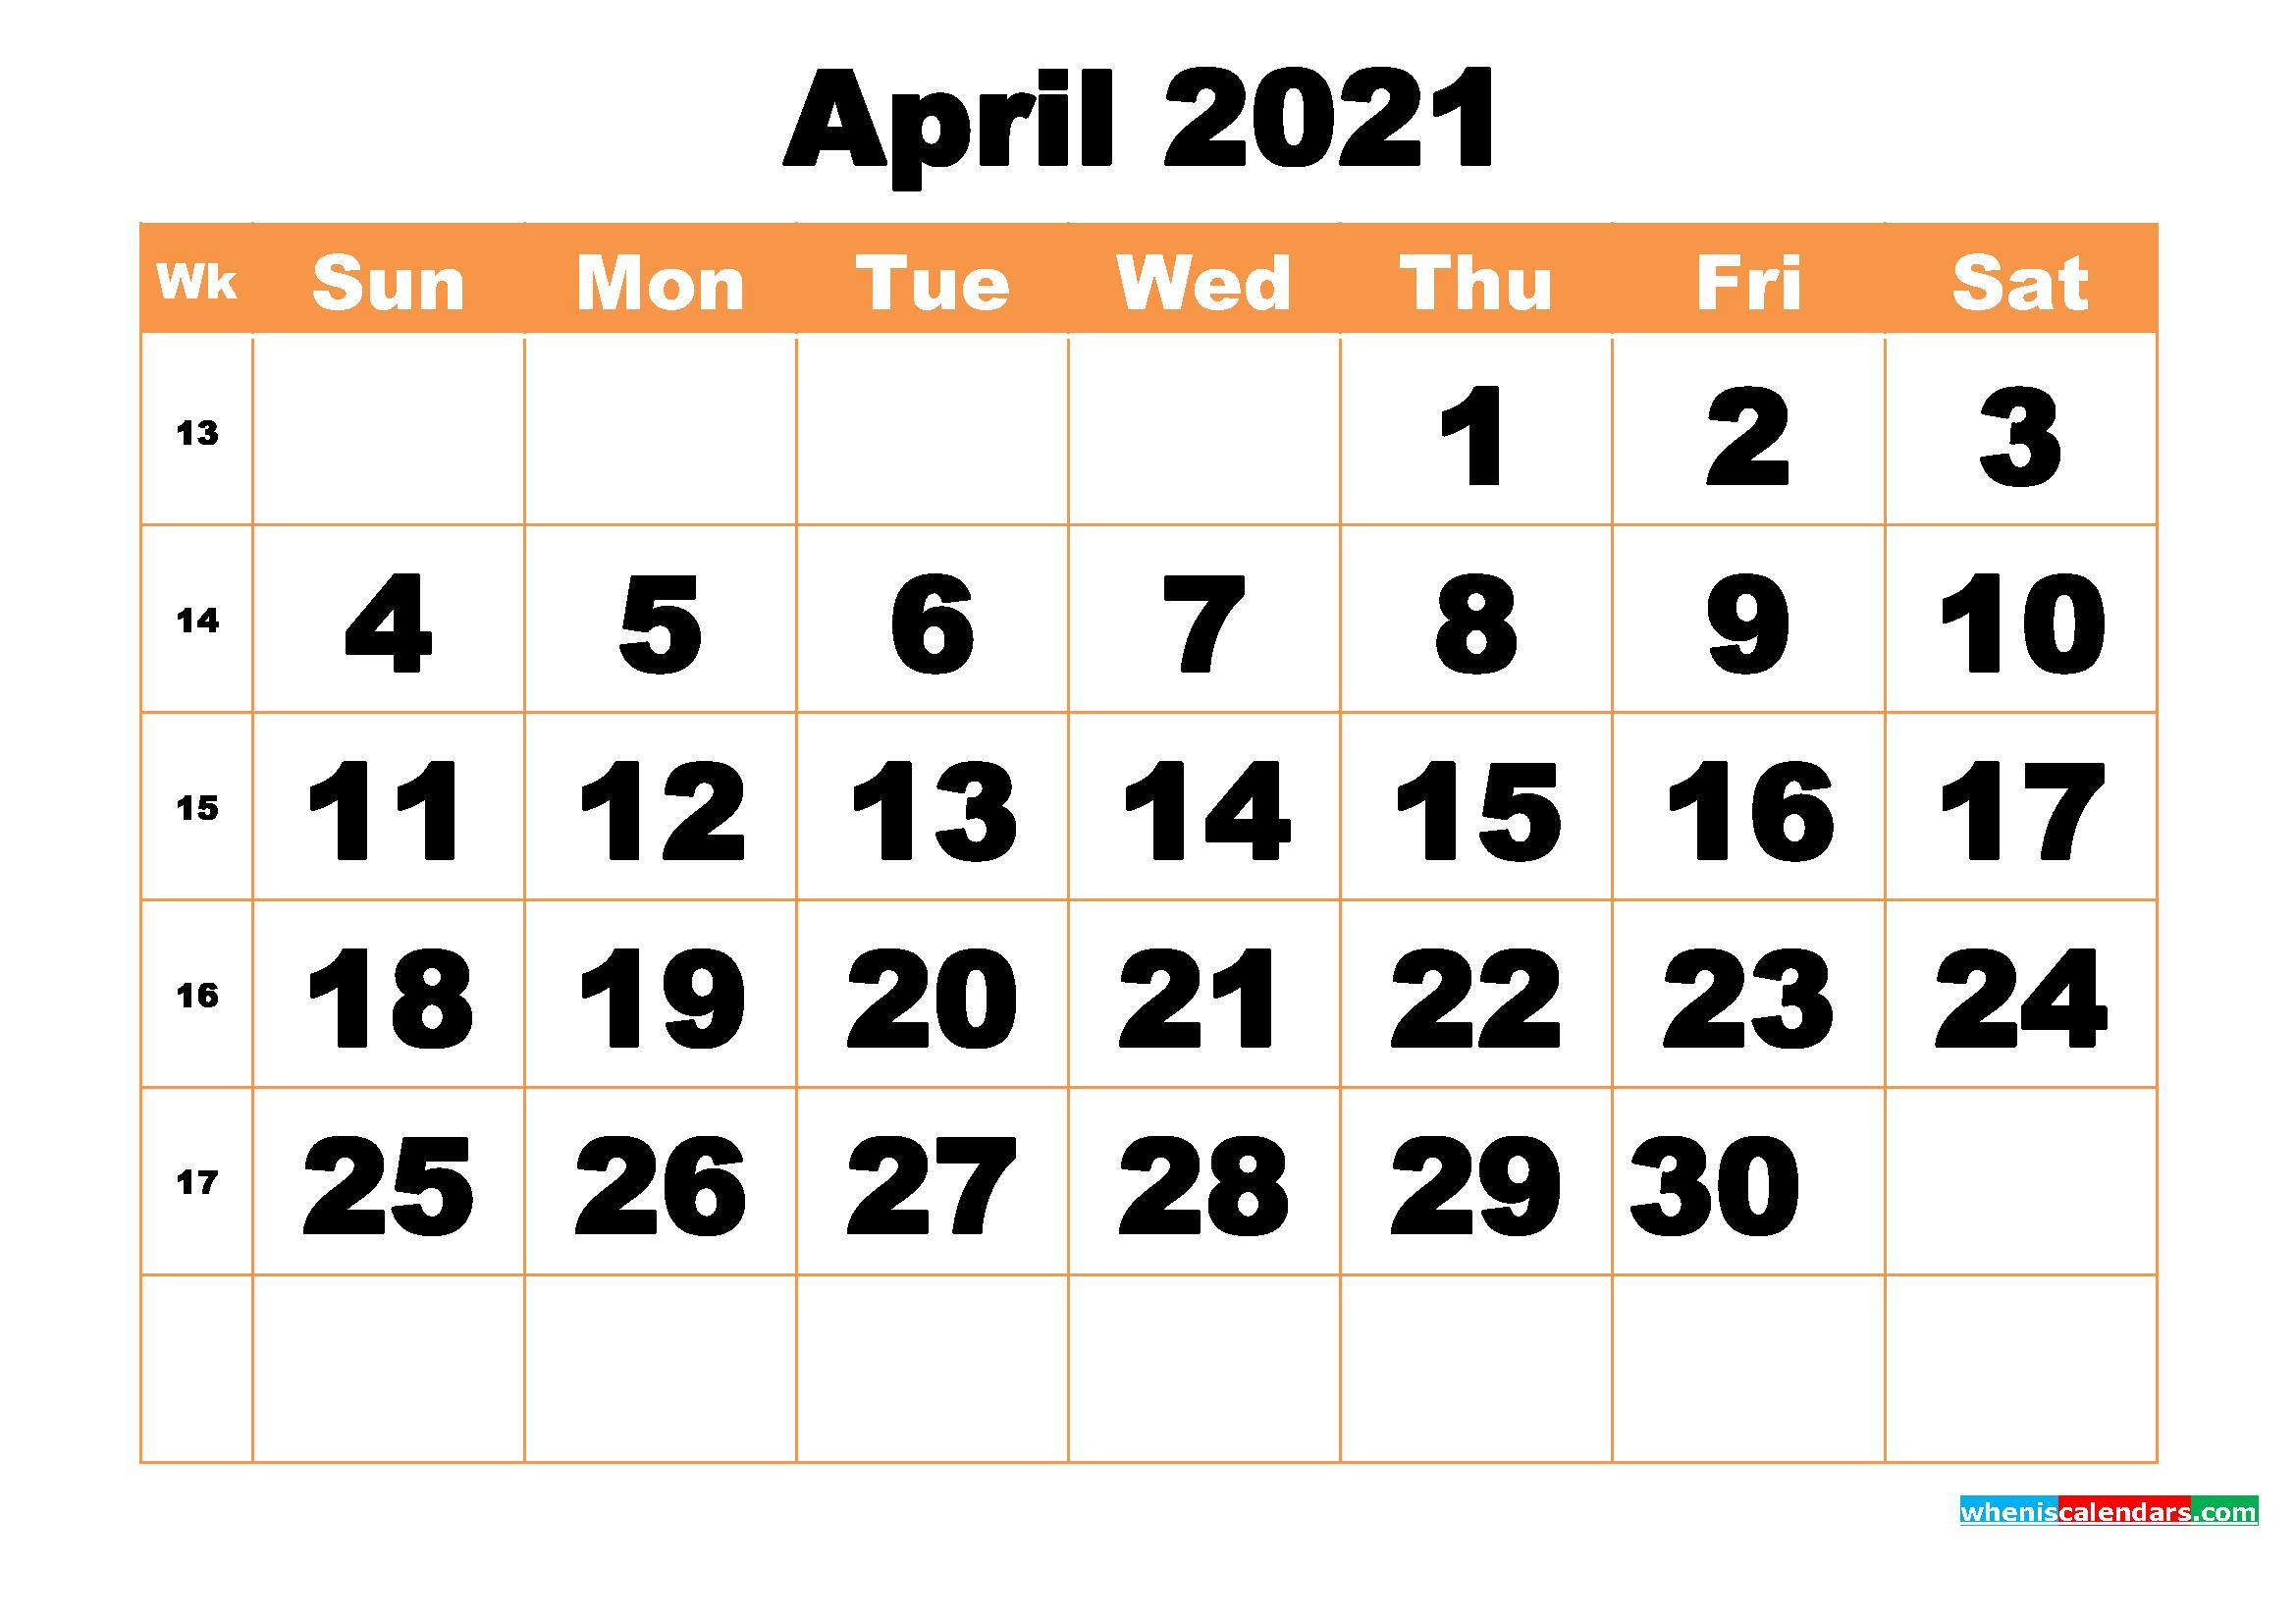 Free Printable April 2021 Calendar Word, PDF, Image